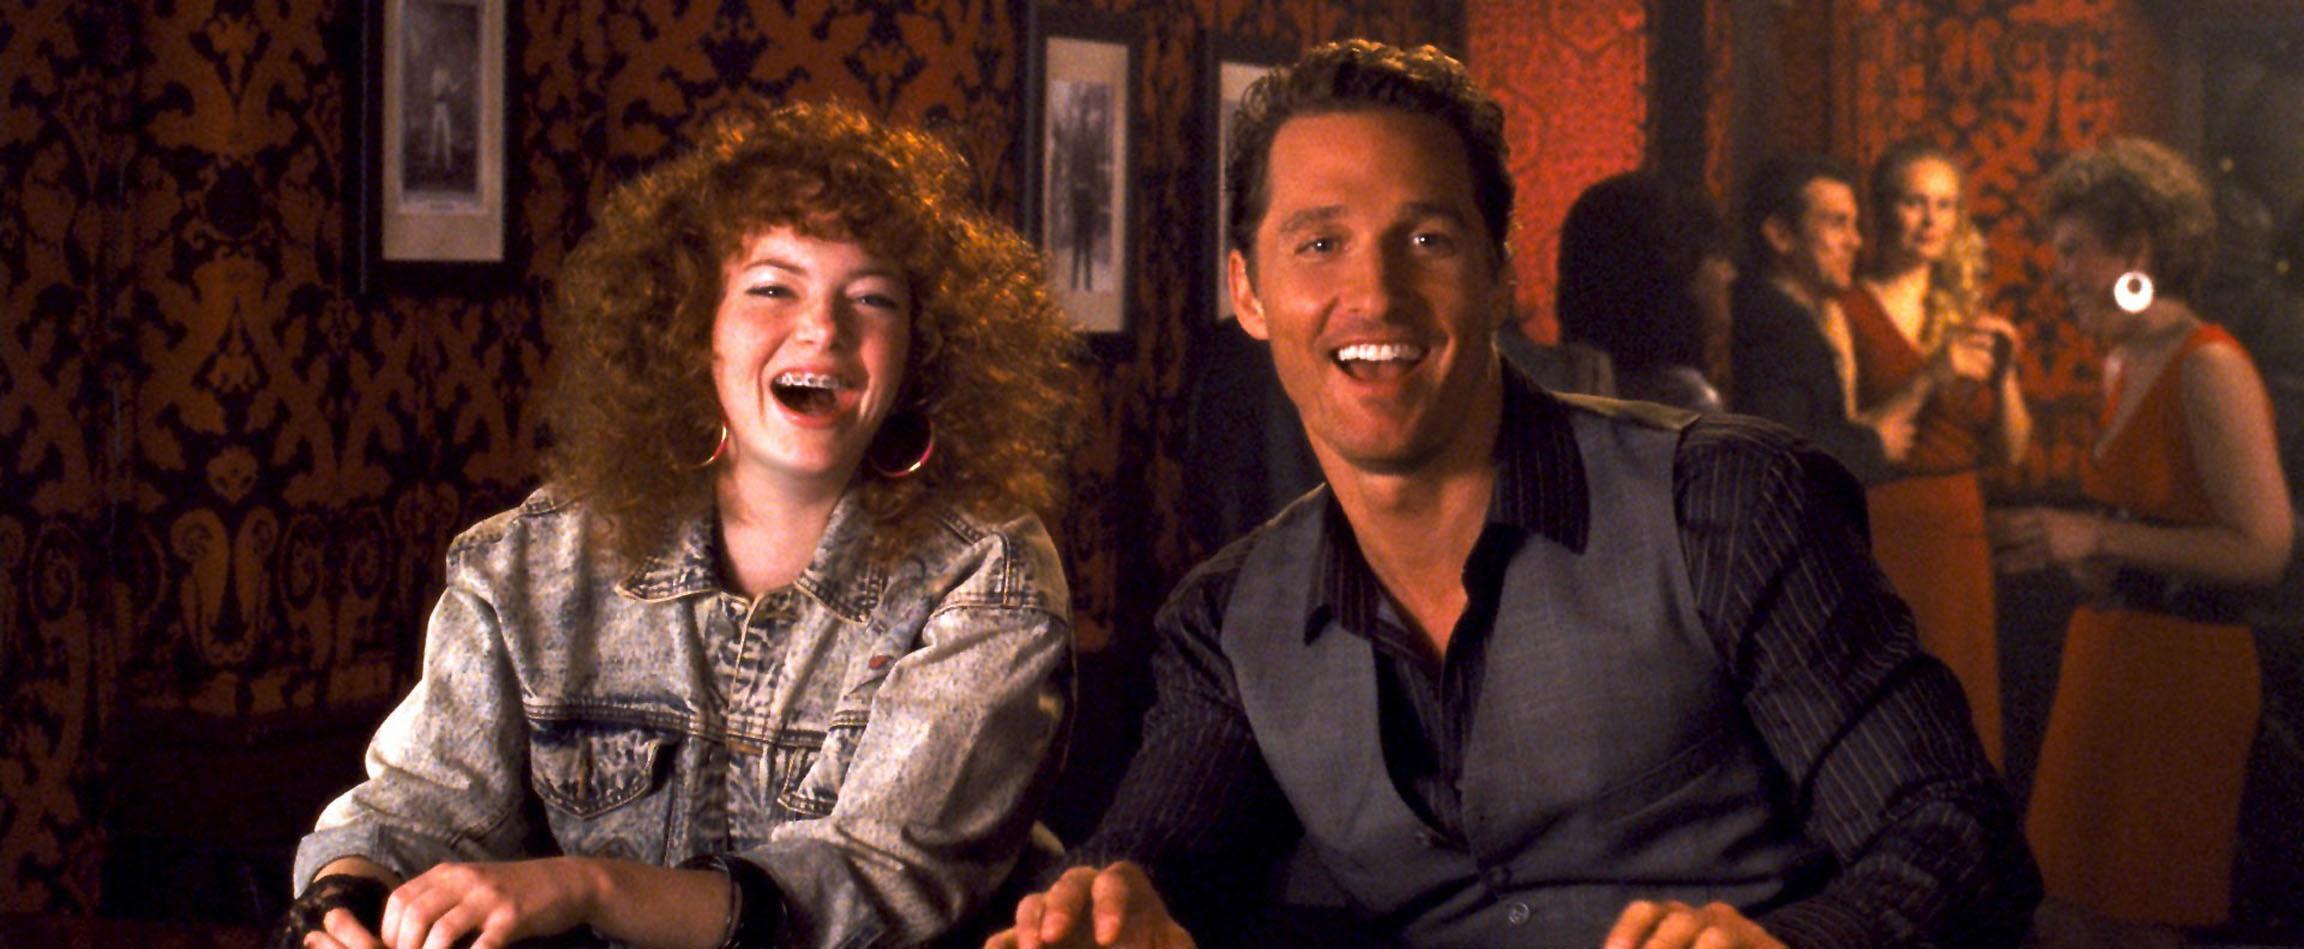 Emma Stone, Matthew McConaughey, Ghosts Of Girlfriends Past